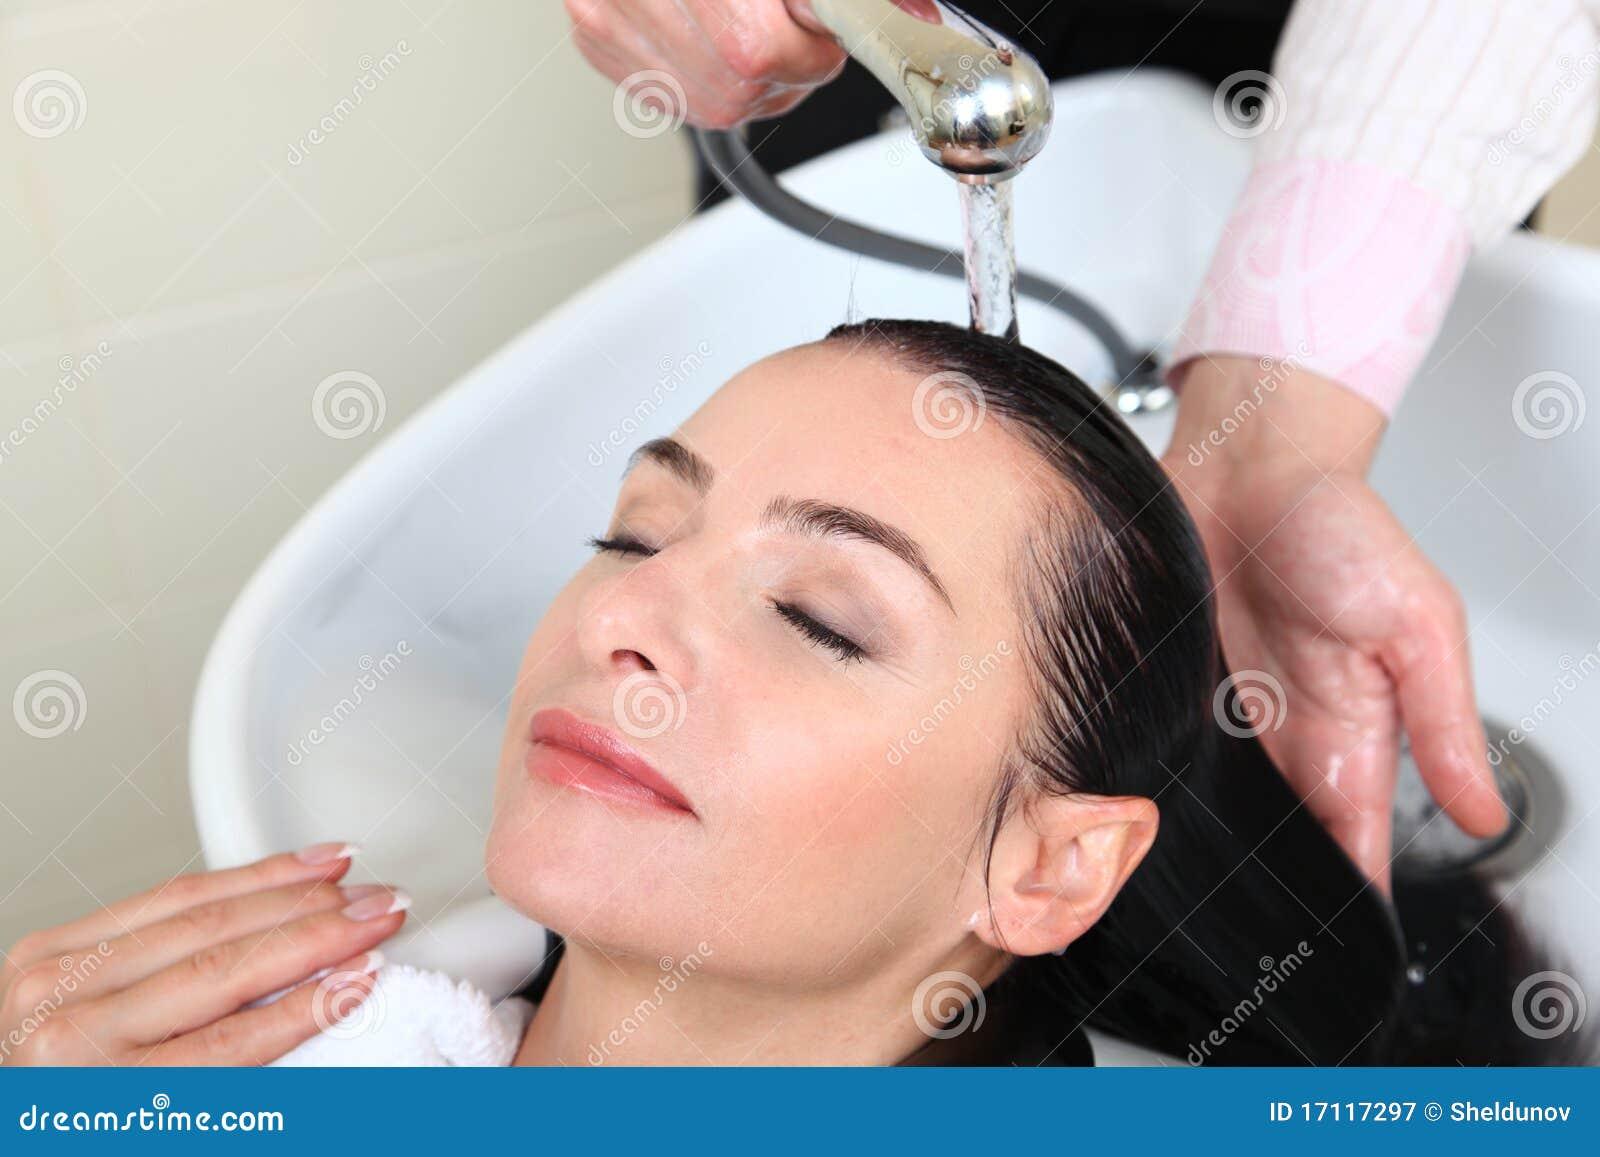 Woman washing hair in salon pool stock image image 17117297 for Wash hair salon